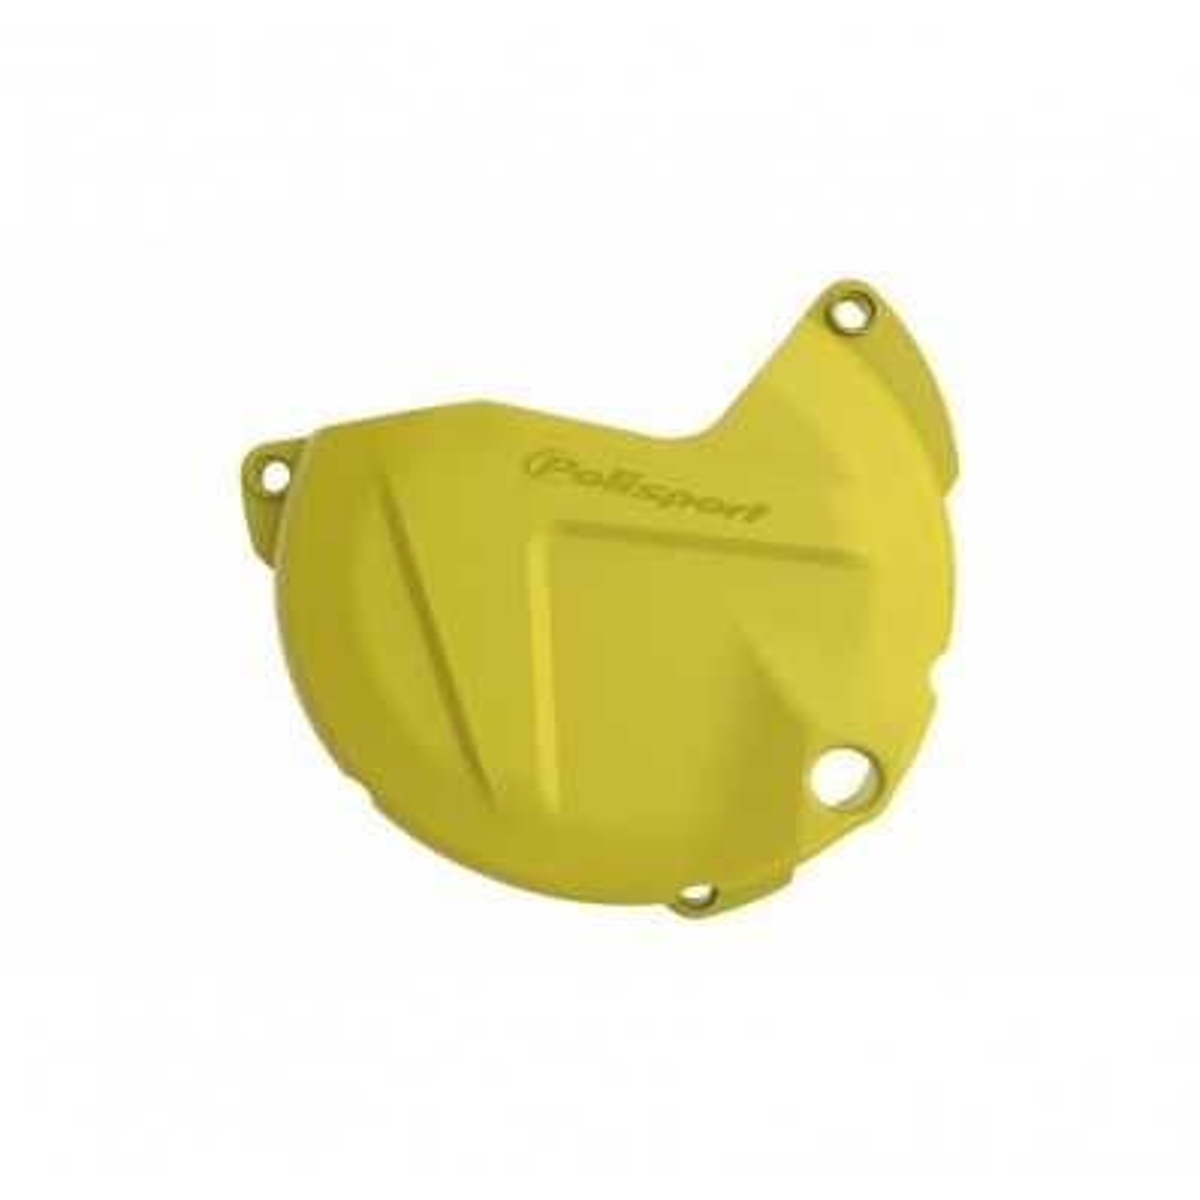 Protector Tapa de Embrague Polisport TC 250 (17-18) husqvarna amarillo